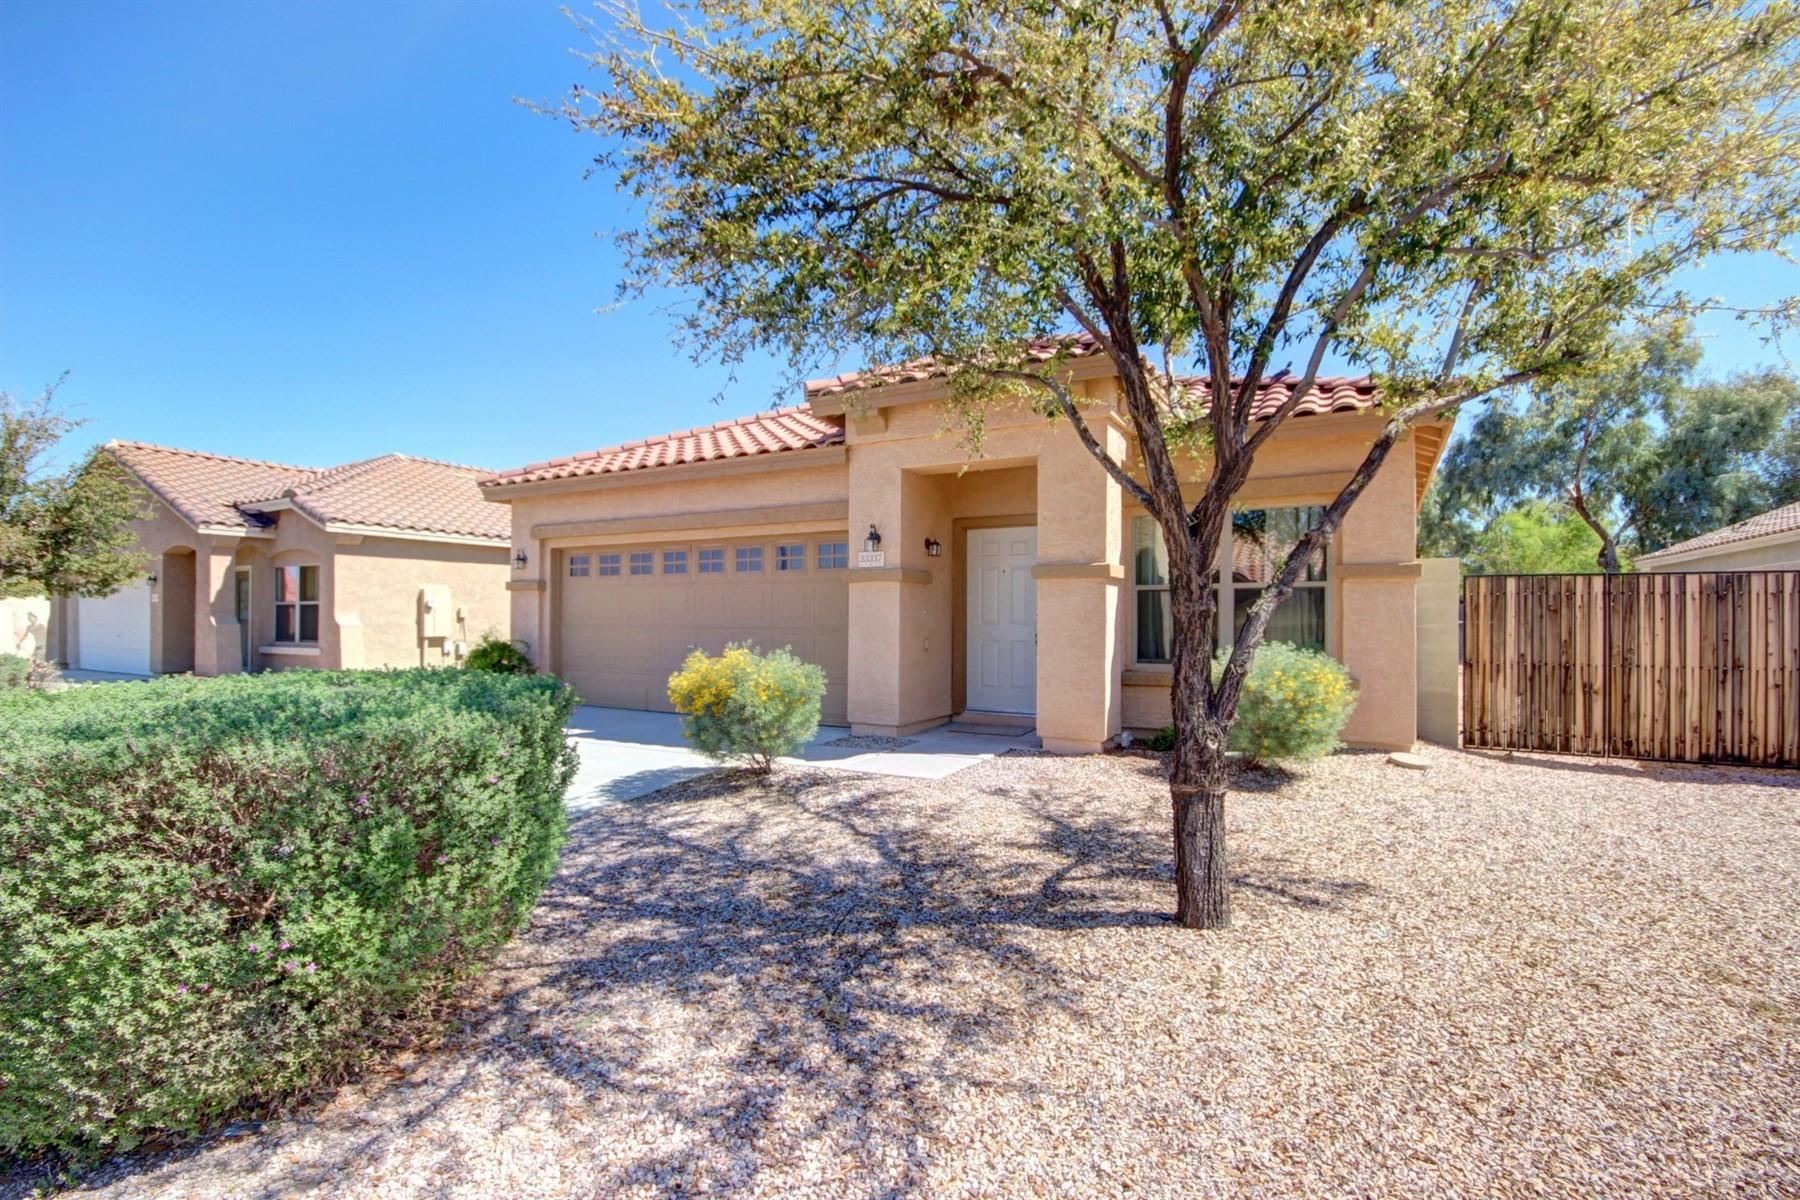 Maison unifamiliale pour l Vente à Charming and spacious remodel in San Tan Heights 33337 N Sonoran Trl Queen Creek, Arizona, 85142 États-Unis